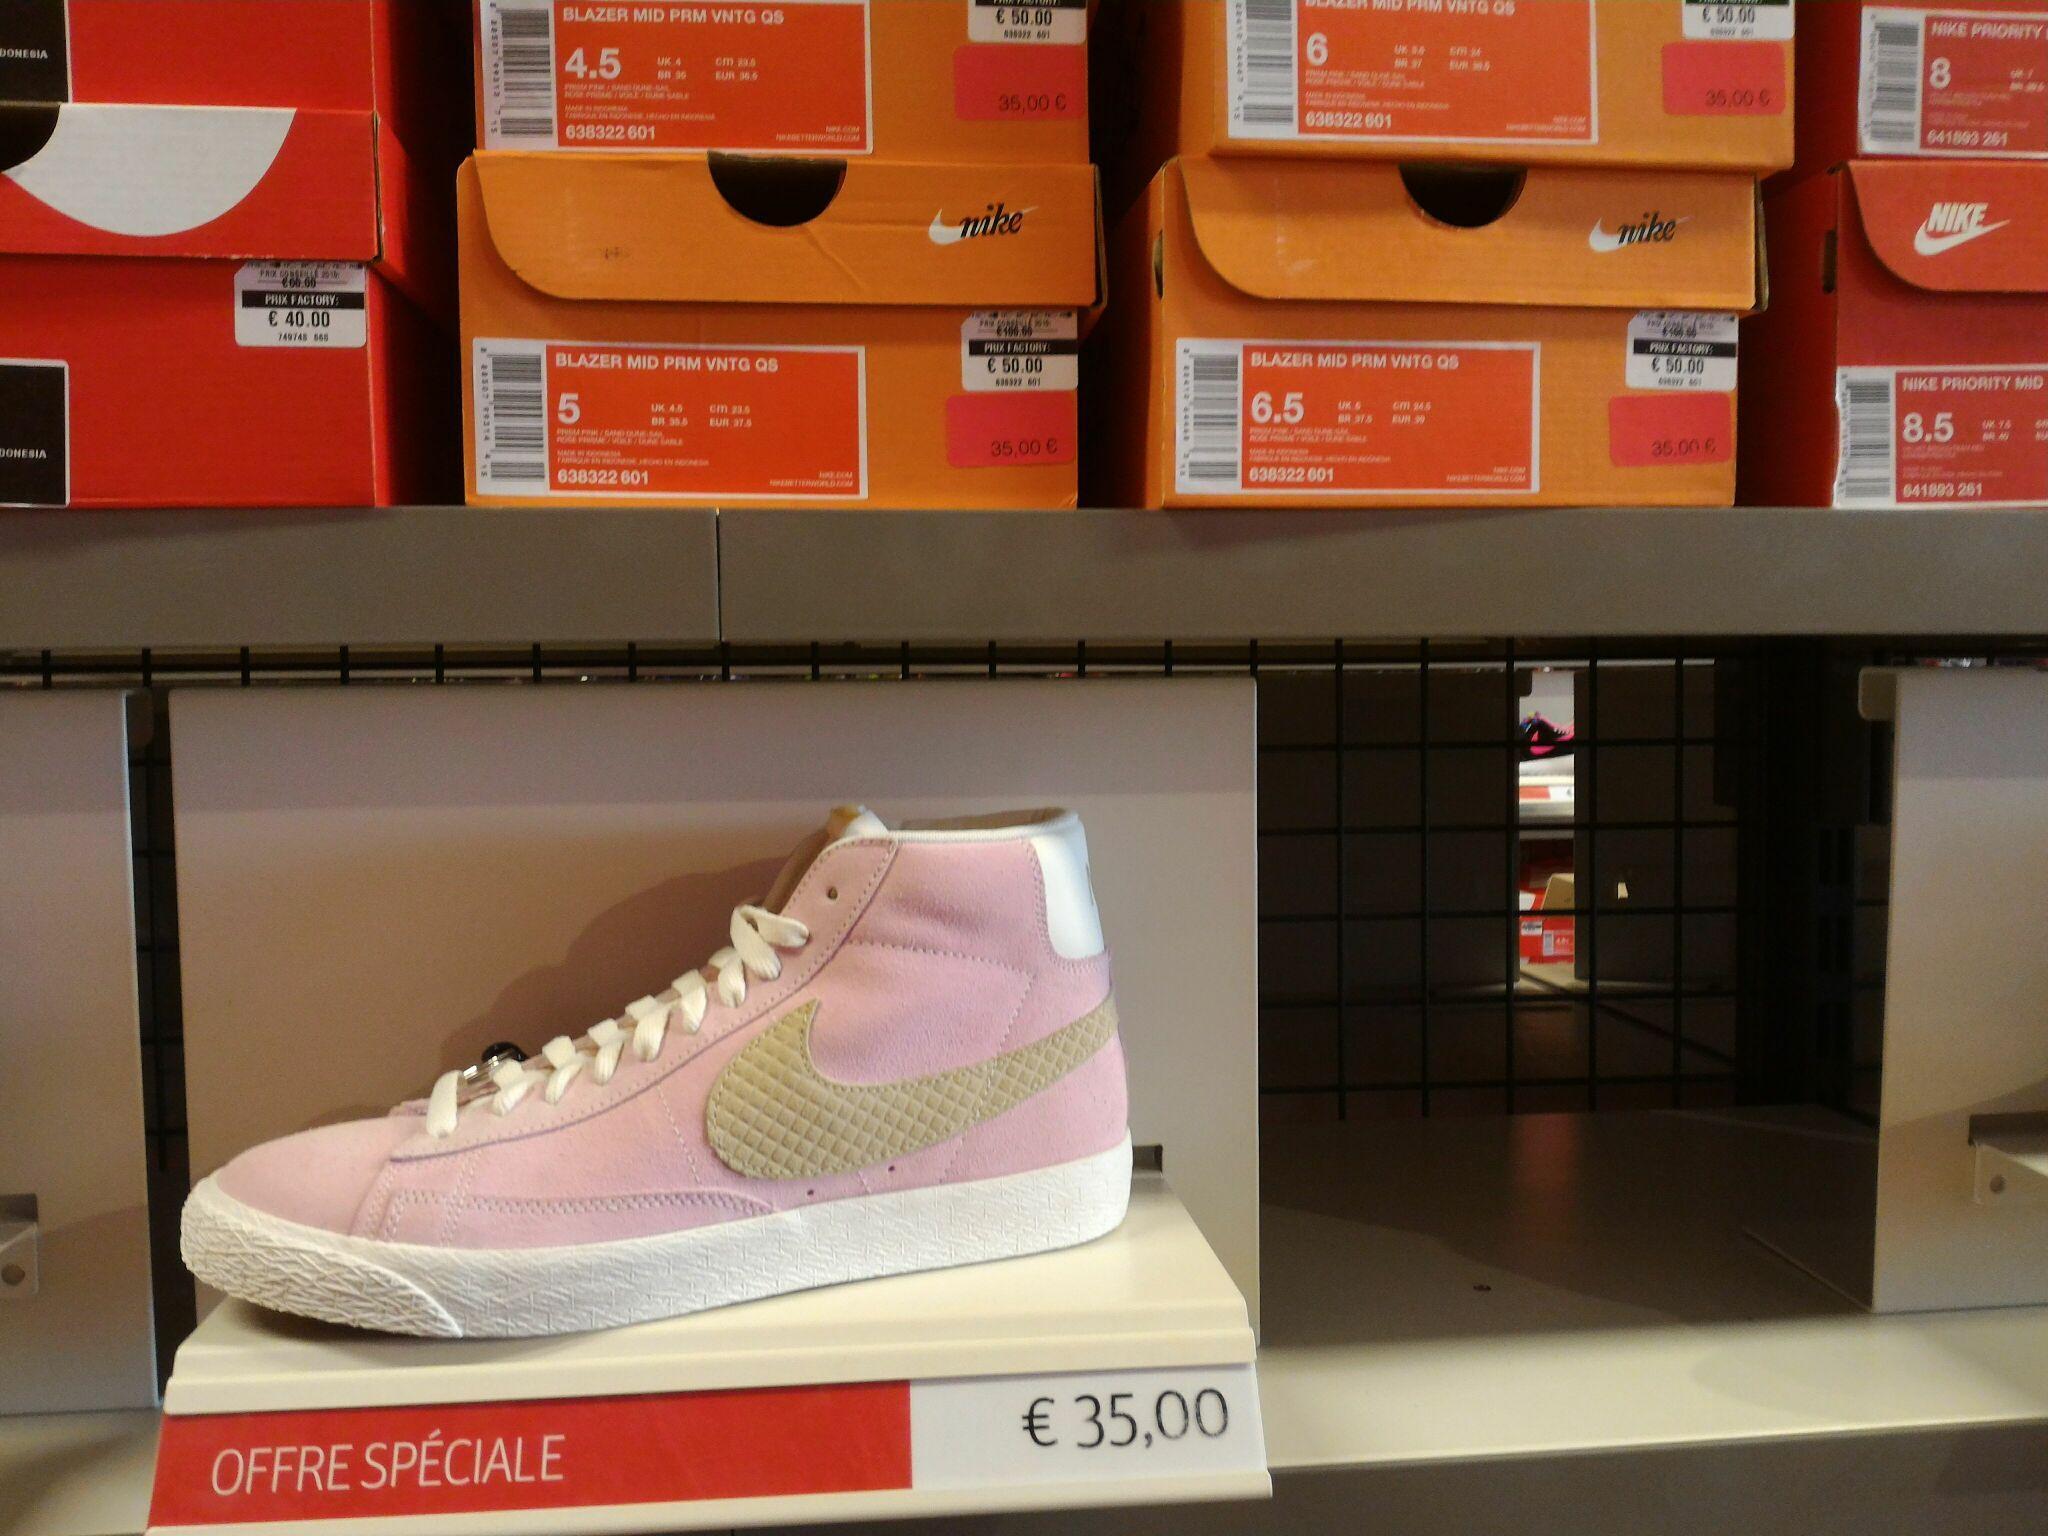 Nike Tiempo Masterful Touche(futsal) 20e, Nike Blazer rose femme (tailles 36.5 au 38.5)